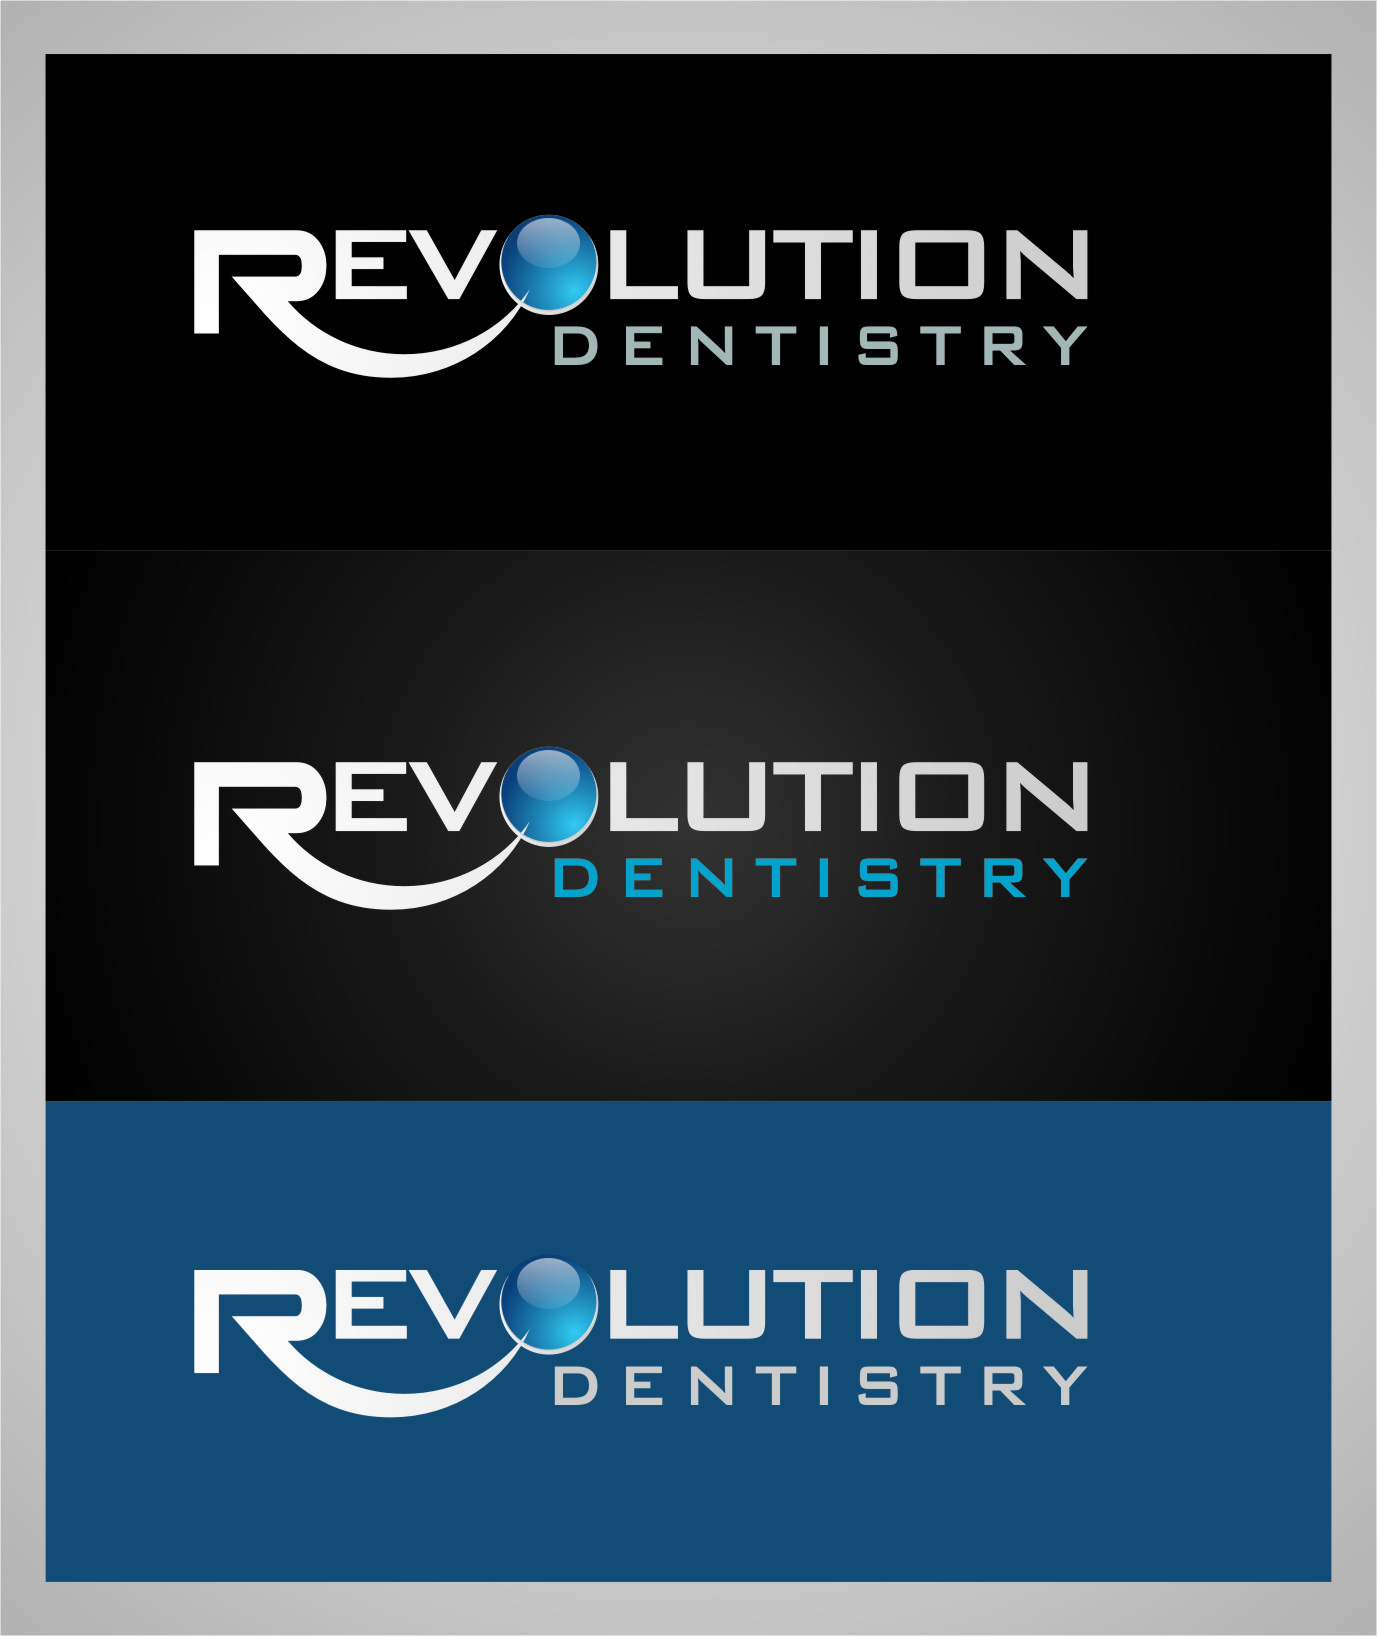 Logo Design by Ngepet_art - Entry No. 186 in the Logo Design Contest Artistic Logo Design for Revolution Dentistry.